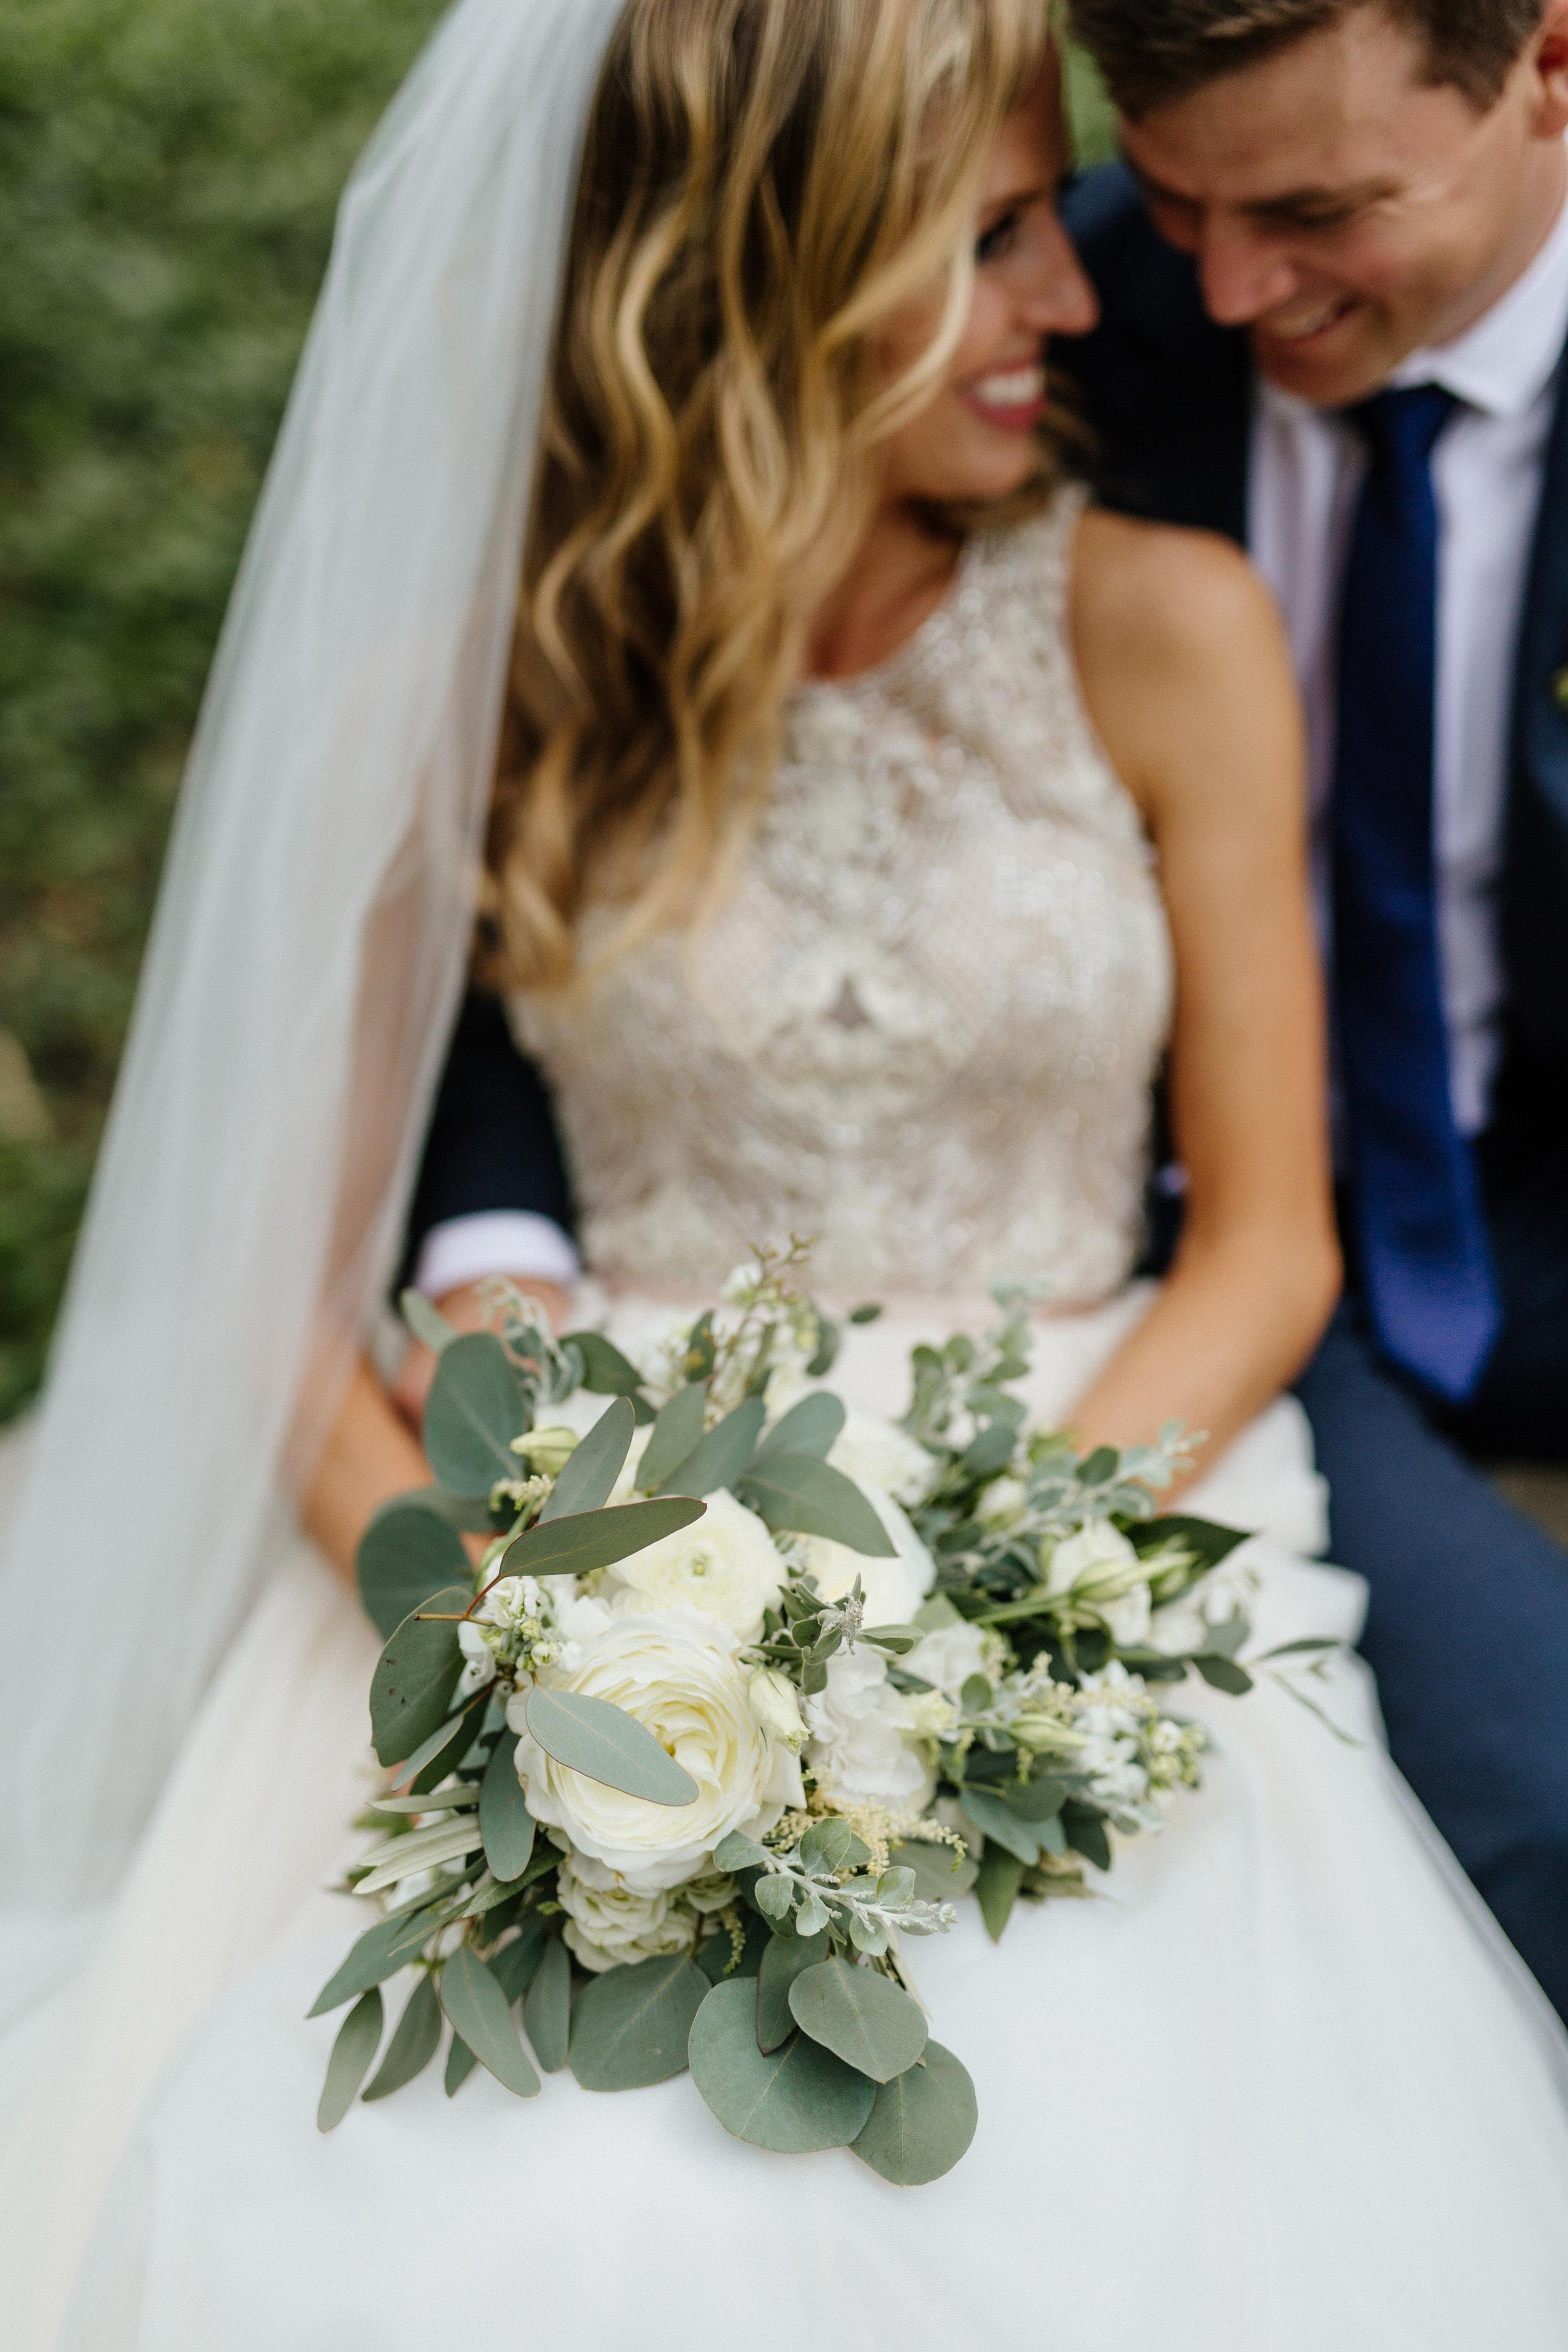 02_jukes_wedding-282.JPG